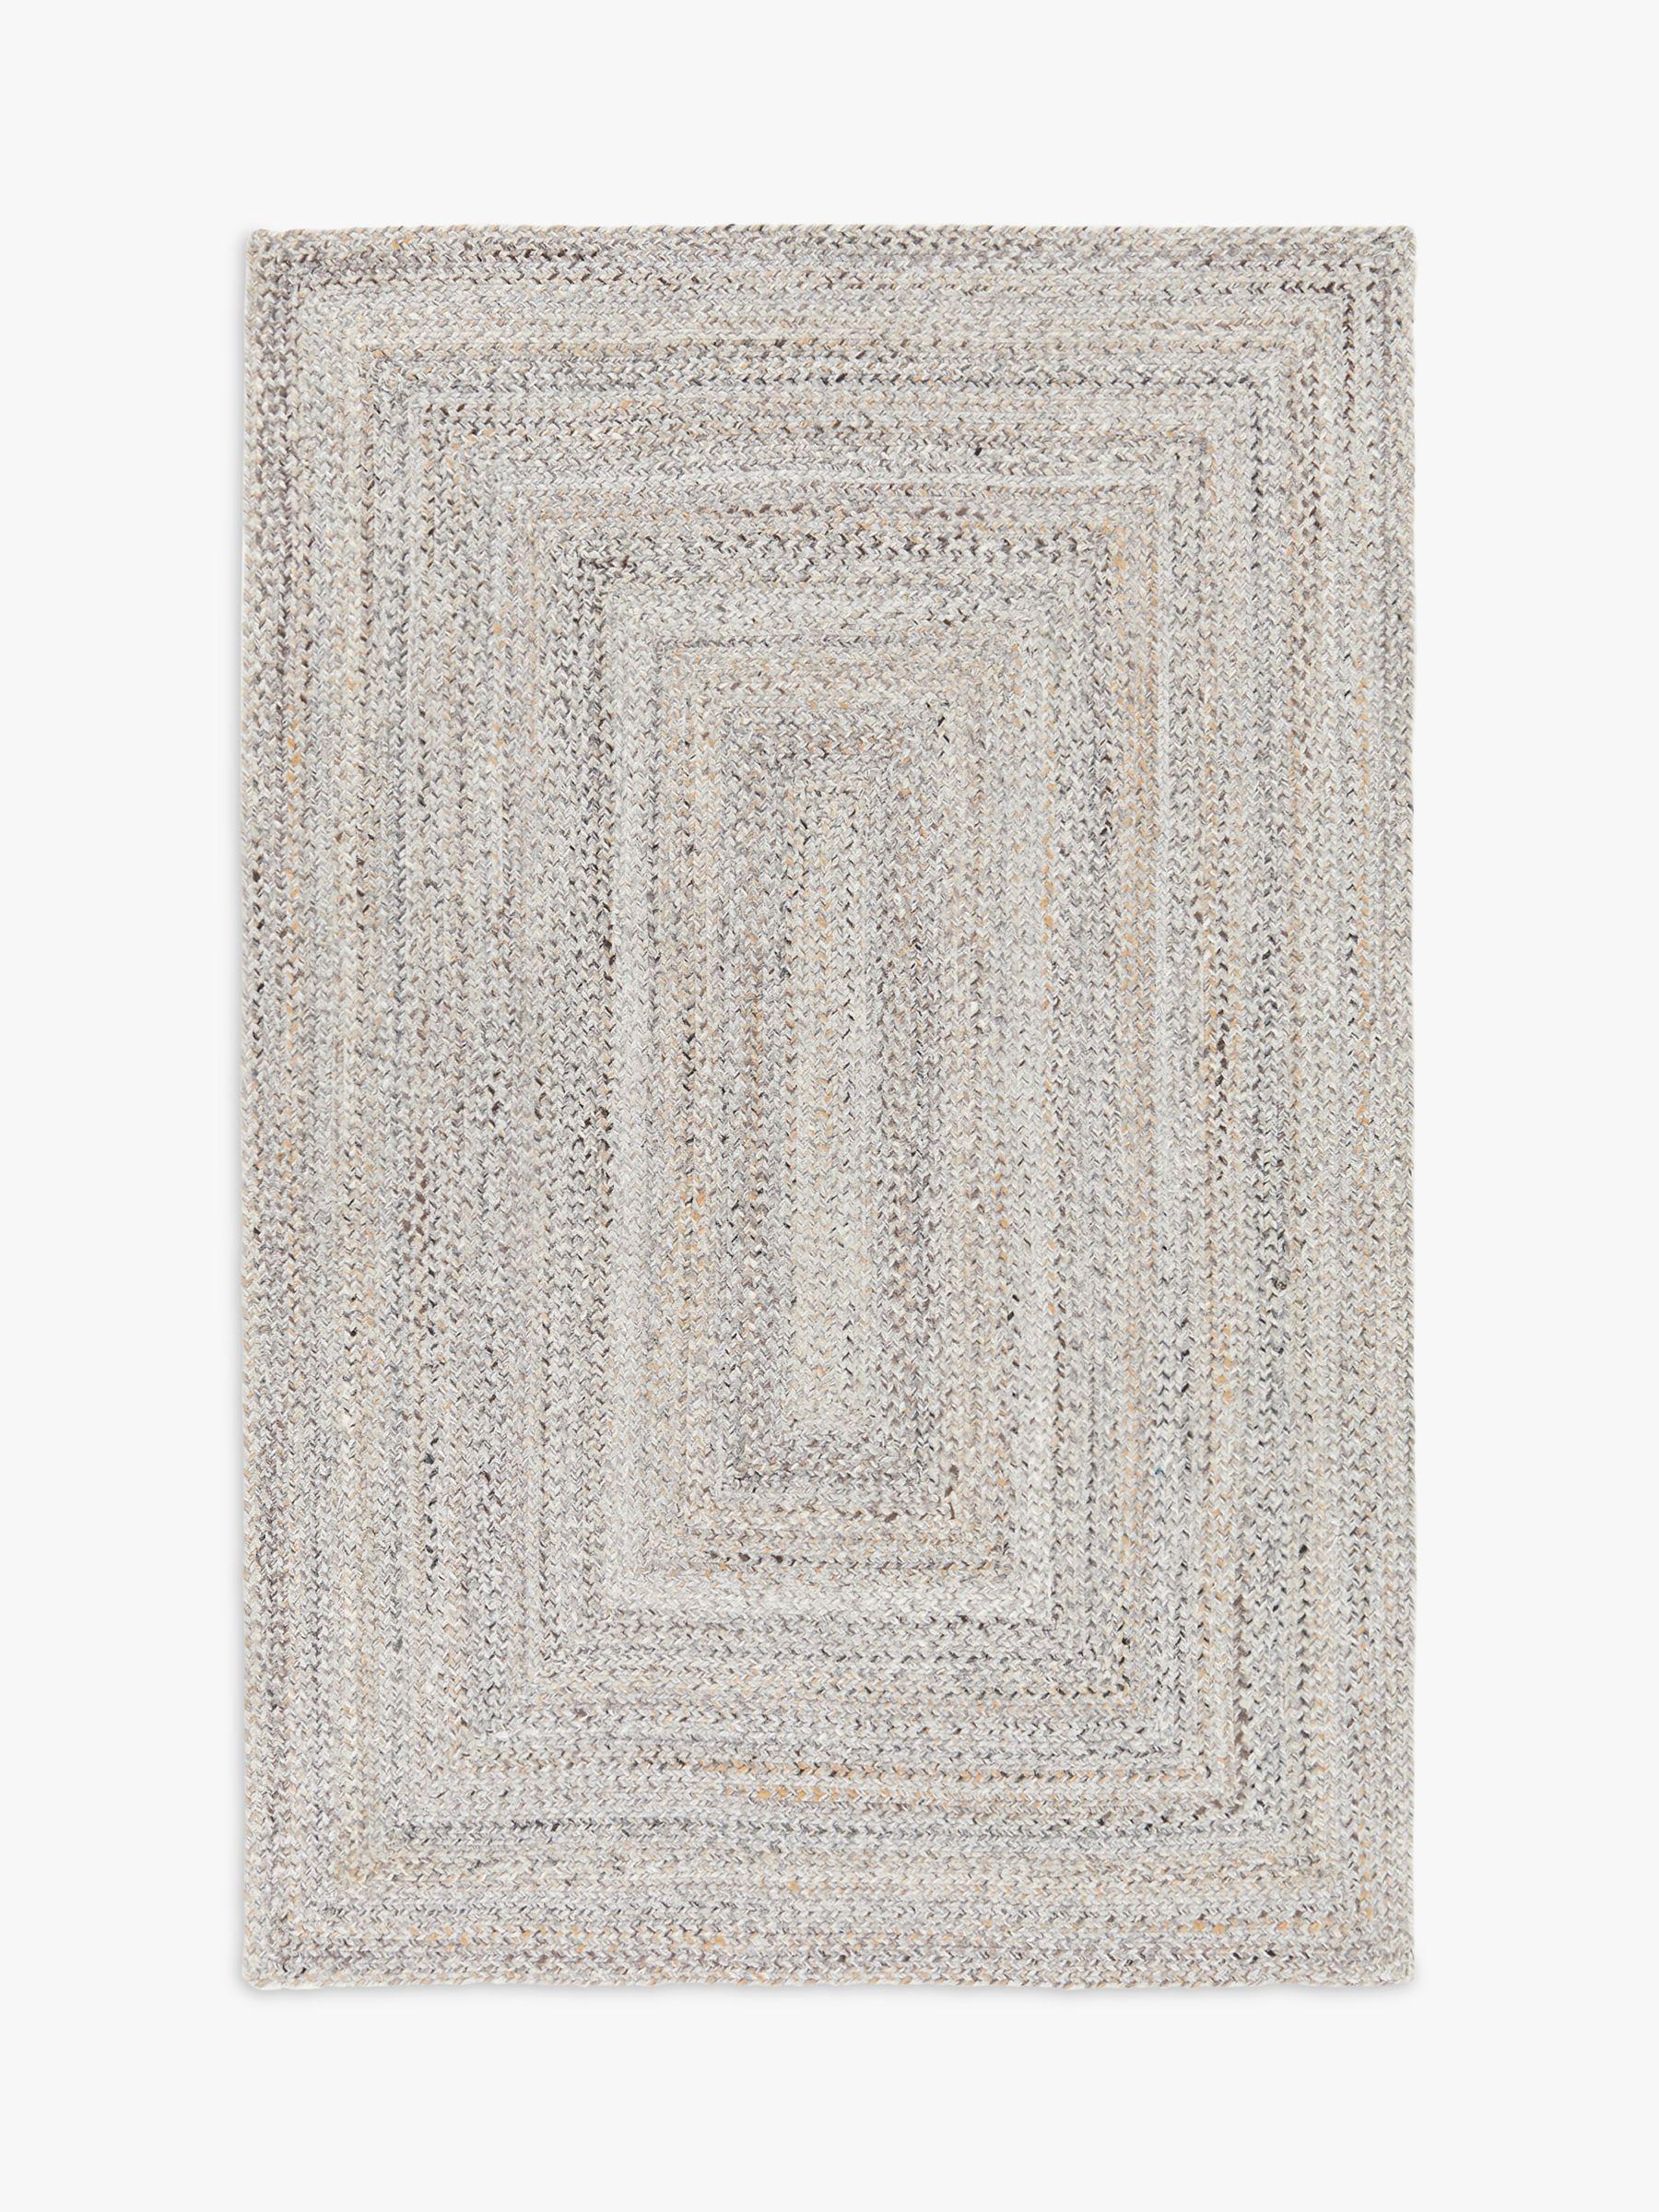 John Lewis & Partners Indoor & Outdoor Braided Rug, Marl Grey